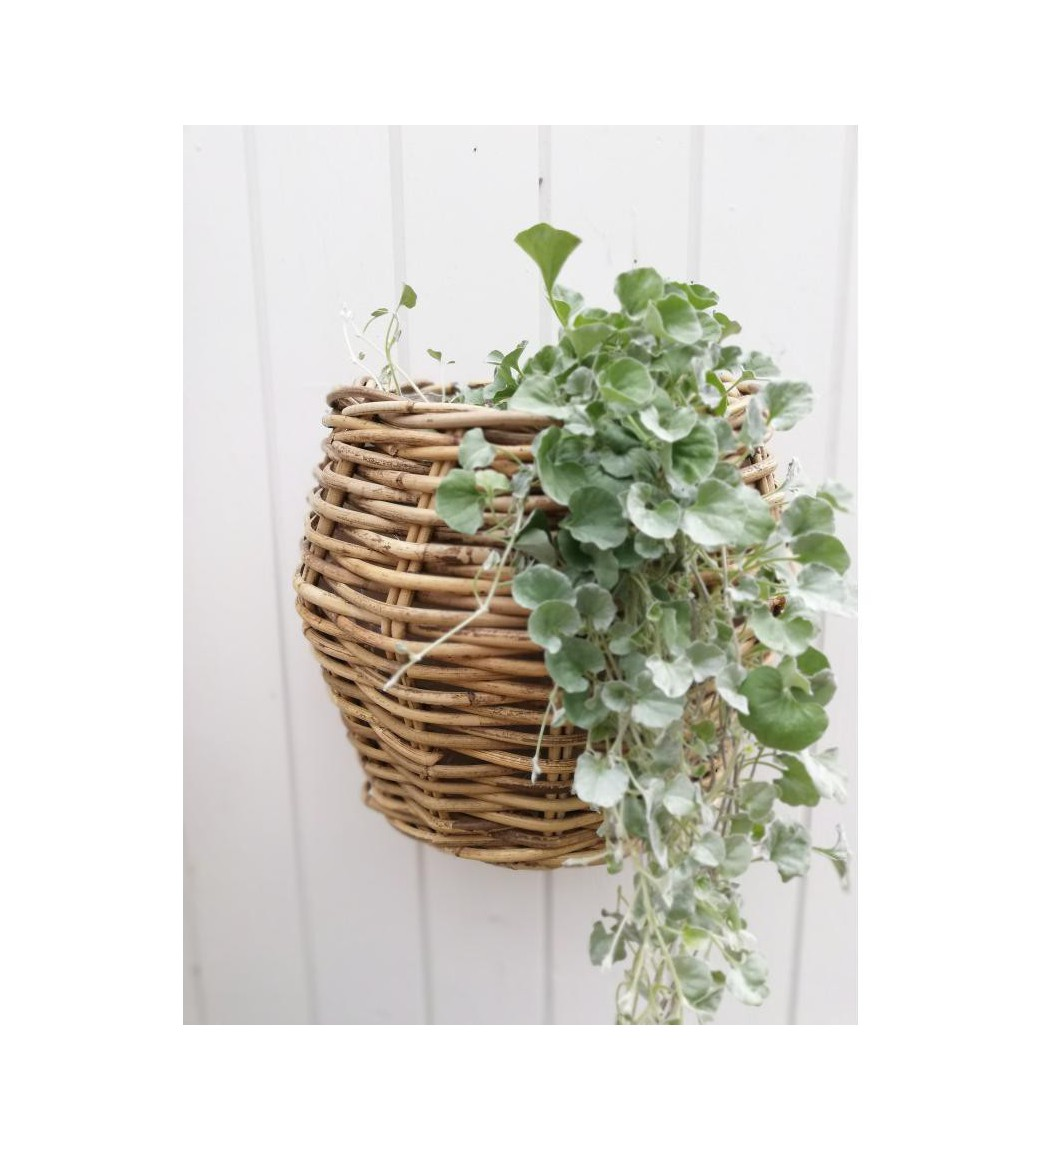 Plantekurv til væg med plastfor H: 28 cm. - 1